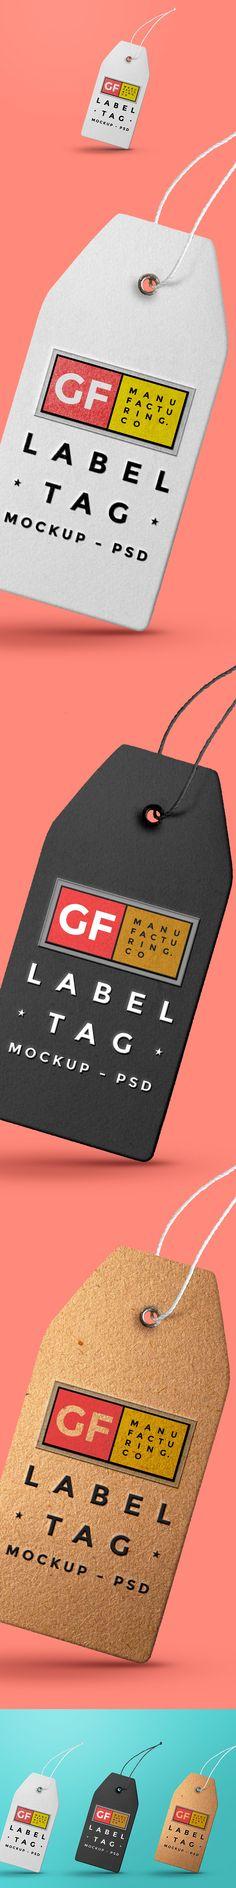 Free Label Tag Mockup PSD (69.8 MB)   Graphics Fuel   #free #photoshop #mockup…